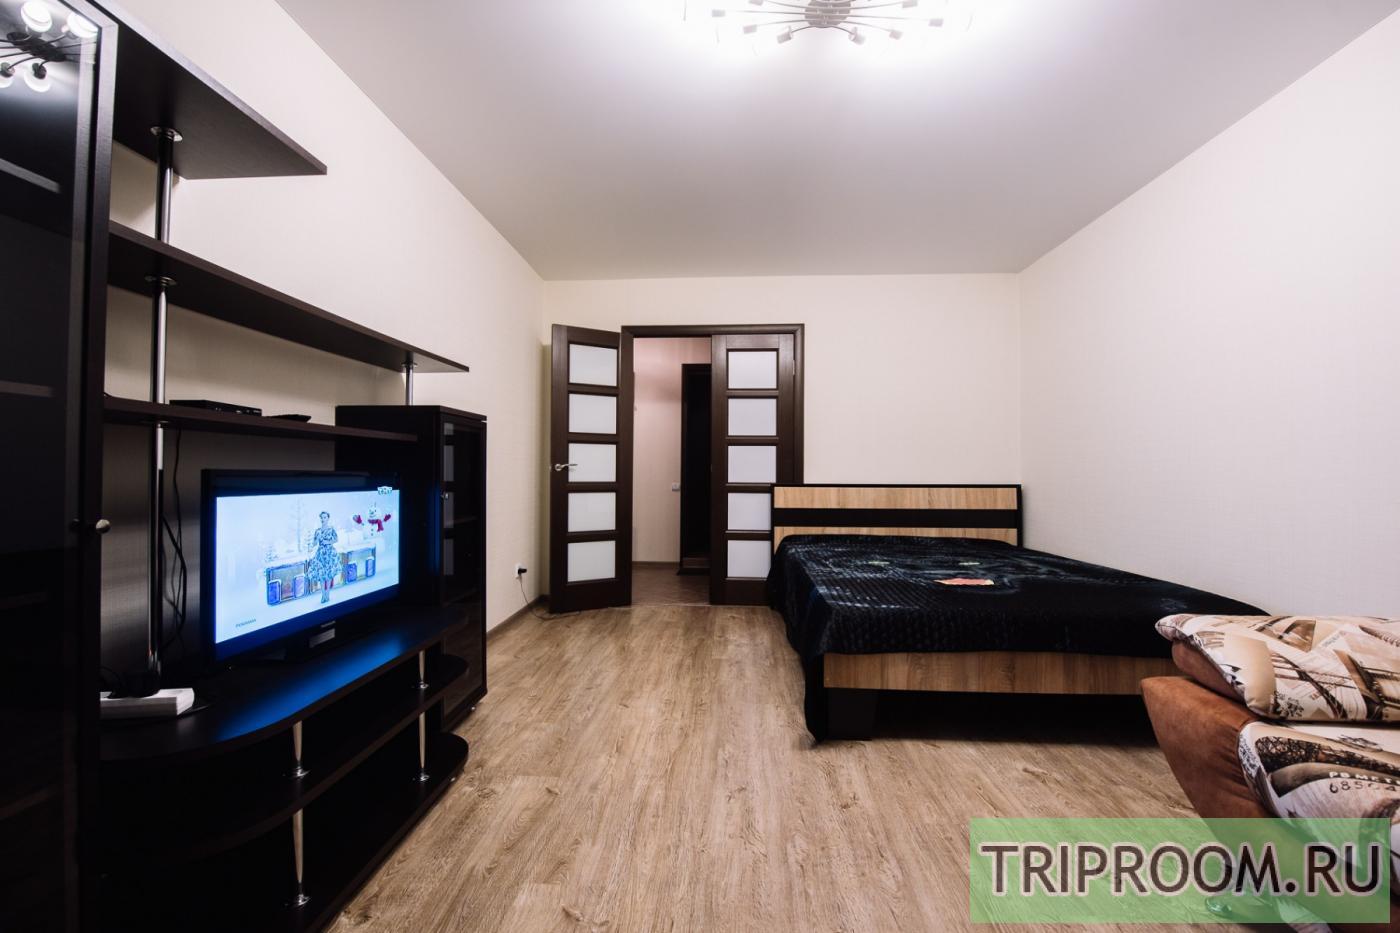 1-комнатная квартира посуточно (вариант № 21616), ул. Нормандия-Неман, фото № 1